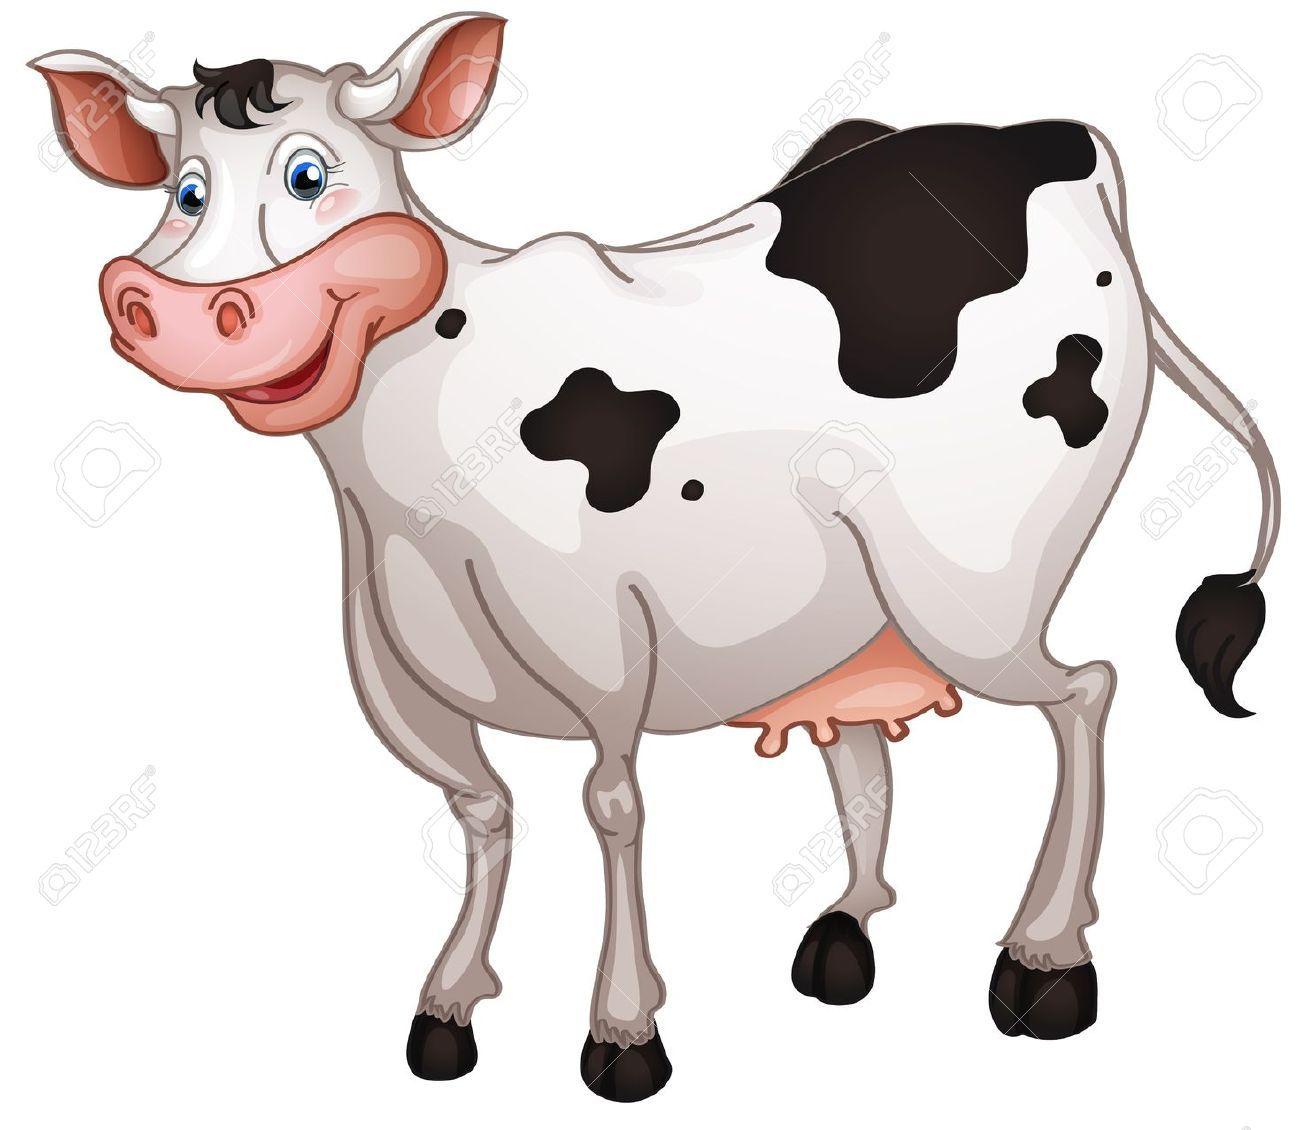 Cow Clipart clip art